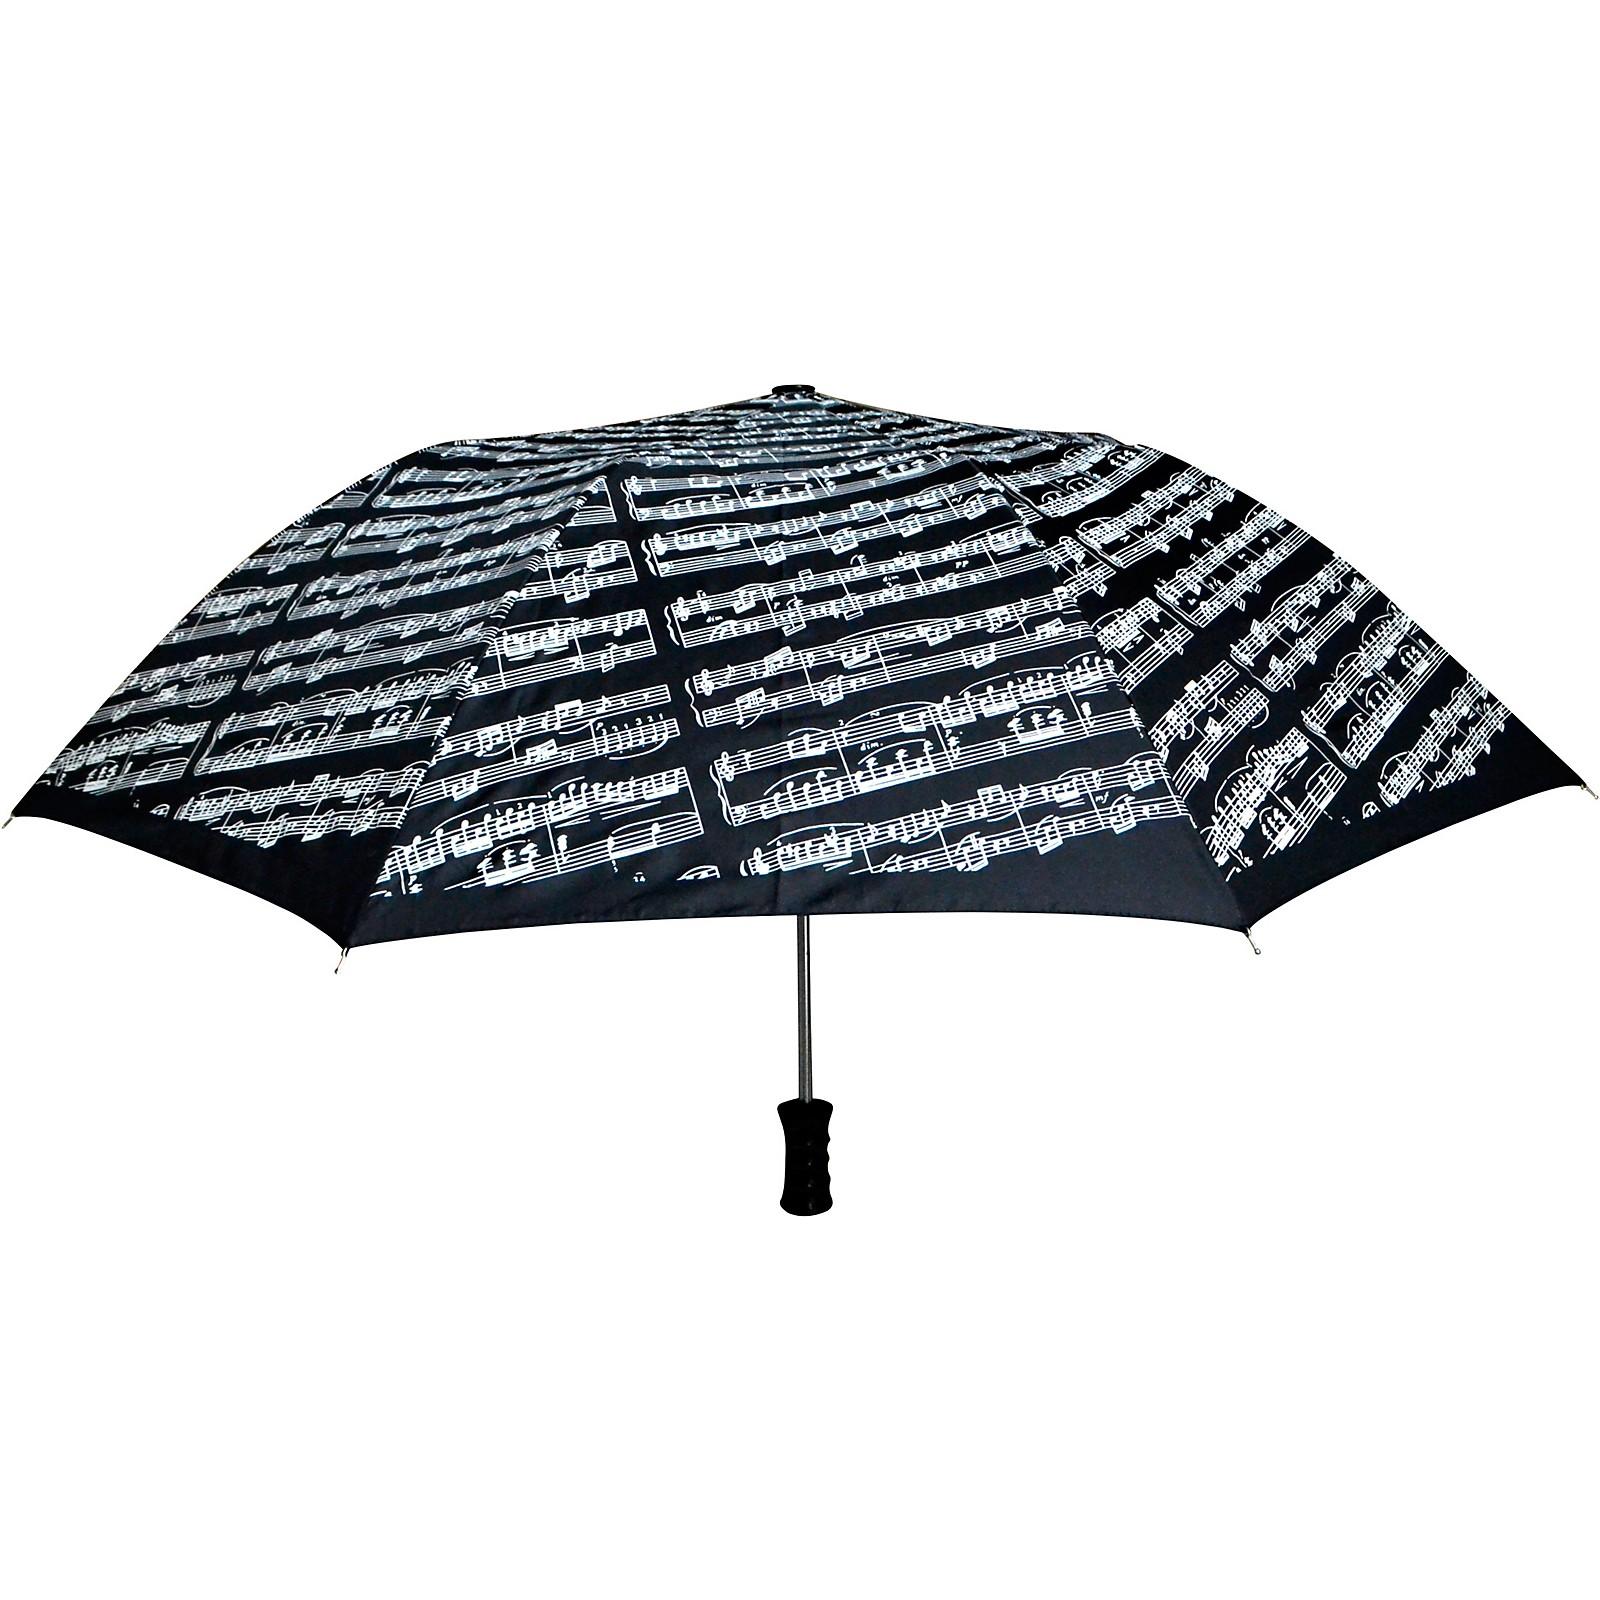 AIM Black Sheet Music Umbrella